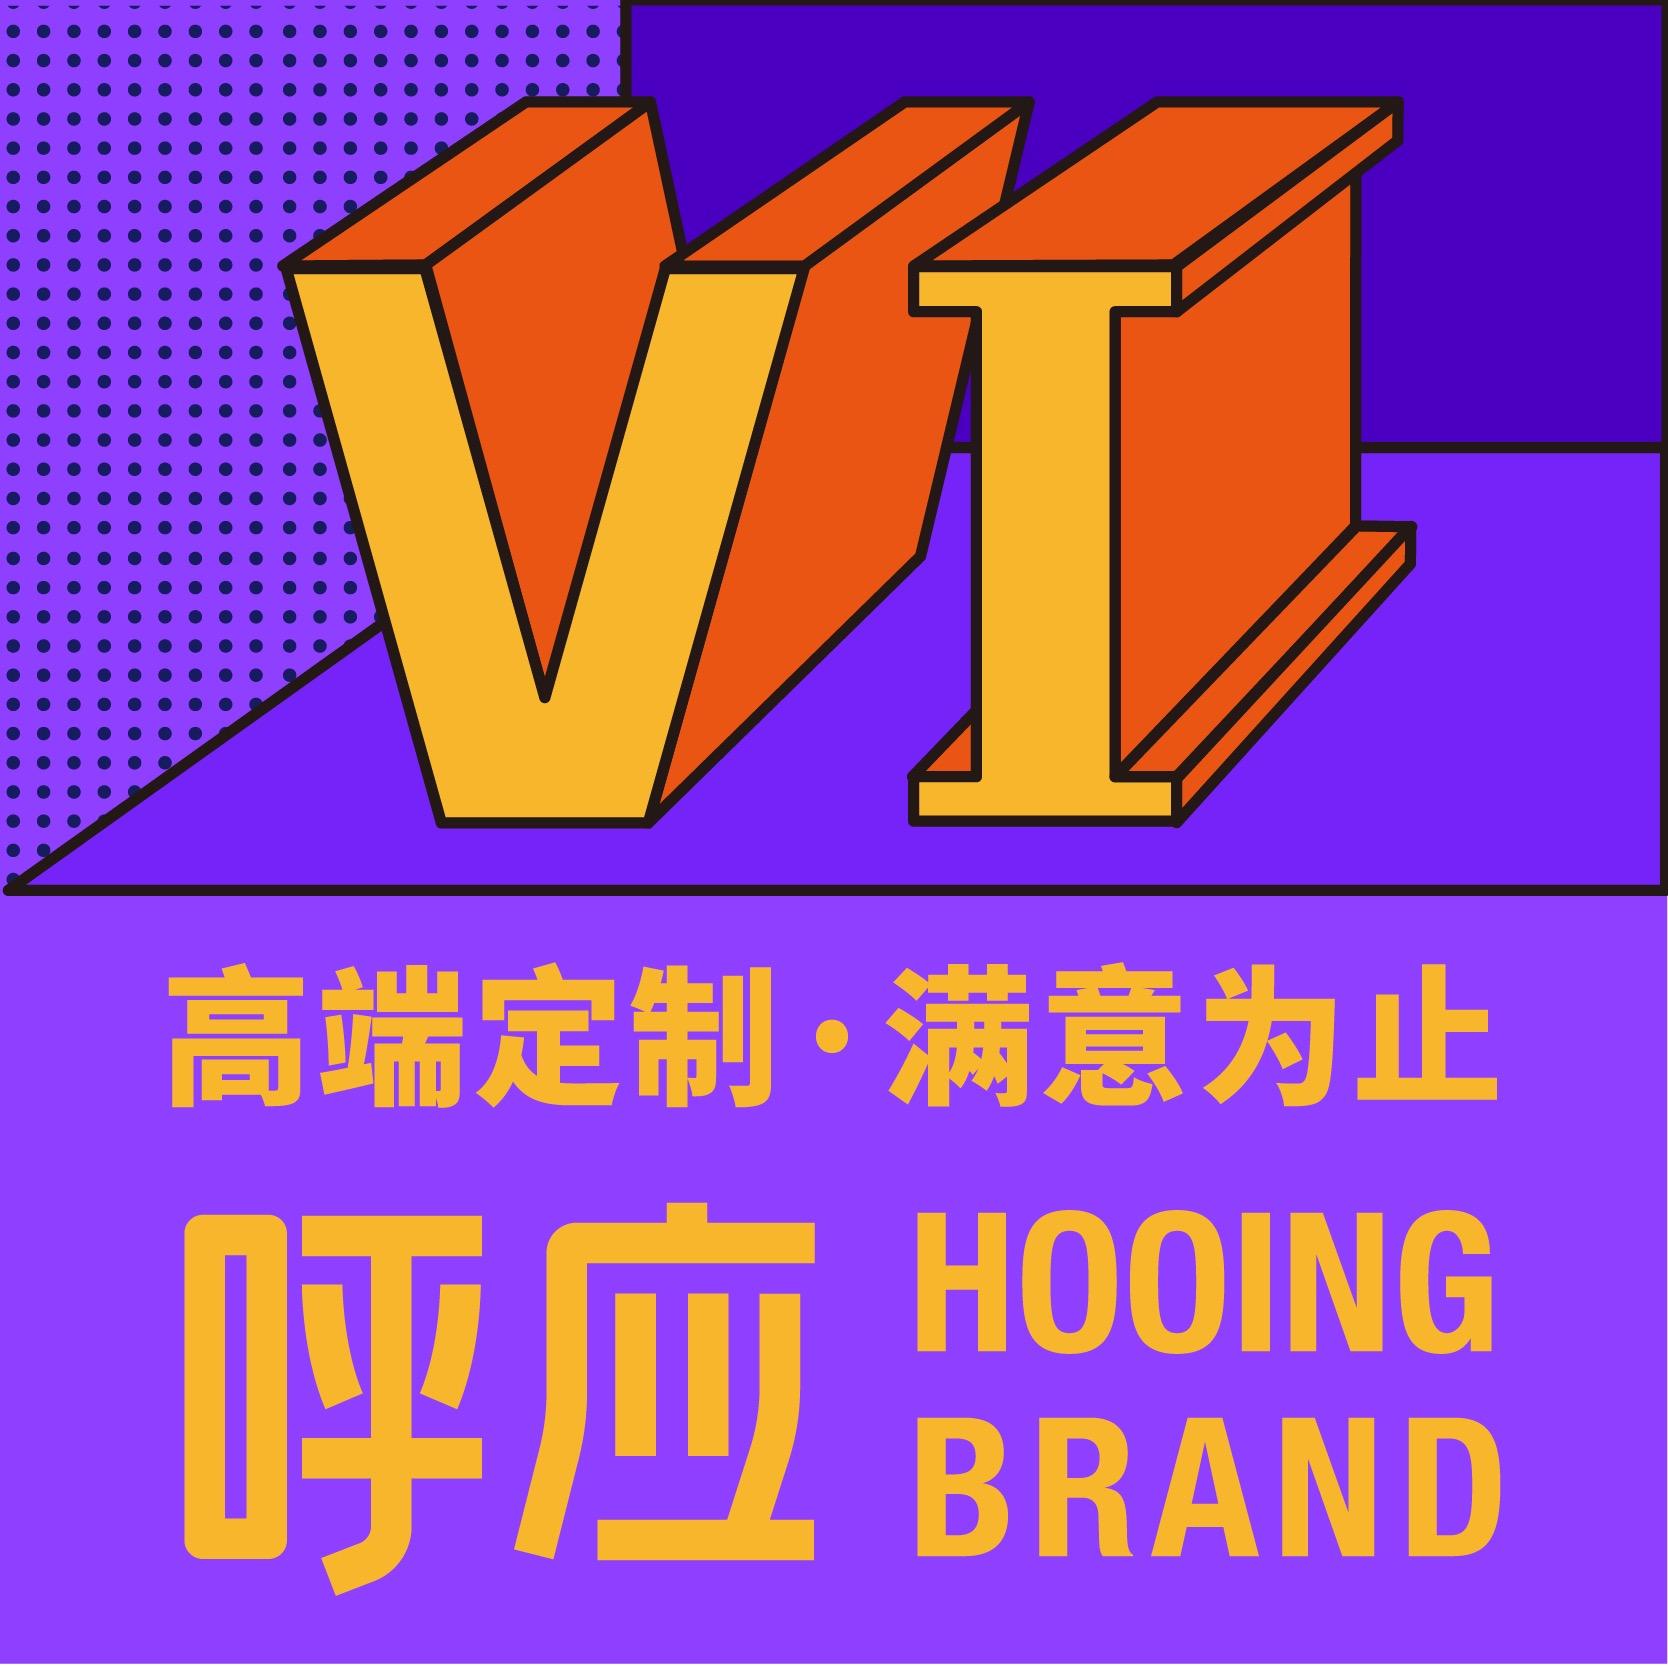 餐饮vi设计/食品vi设计/vi全套设计/企业VI/地产VI